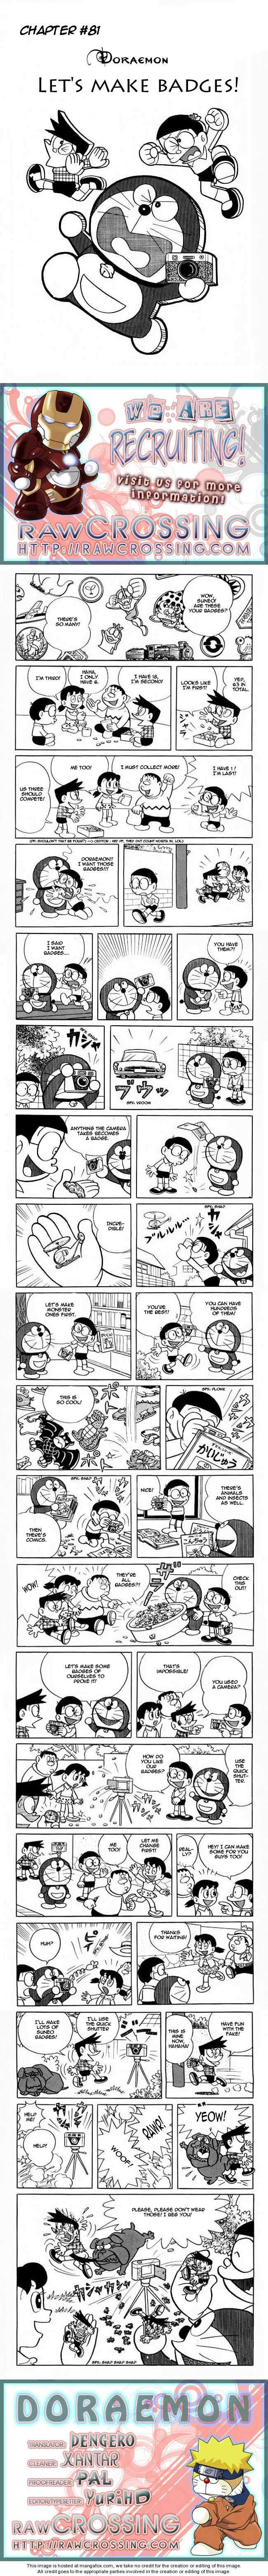 Doraemon 81 Page 1